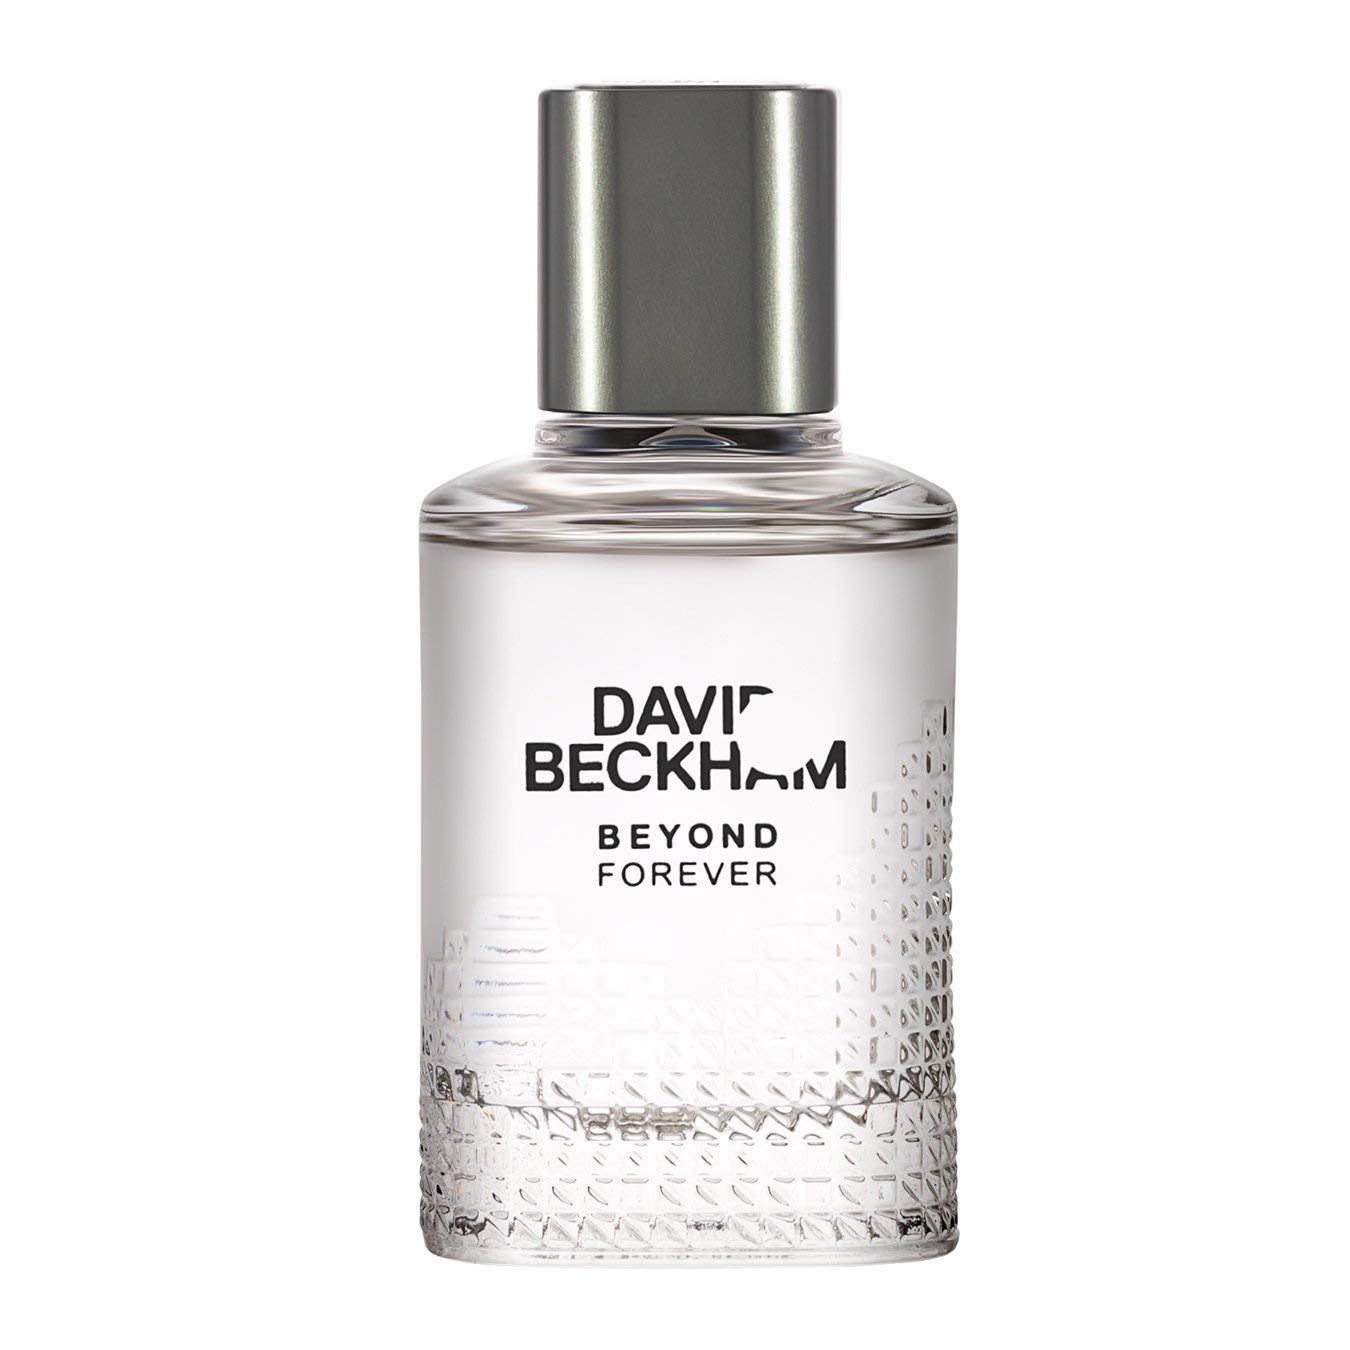 David Beckham Beyond Forever Eau De Toilette Perfume for Men, 90ml Coty 32278500000